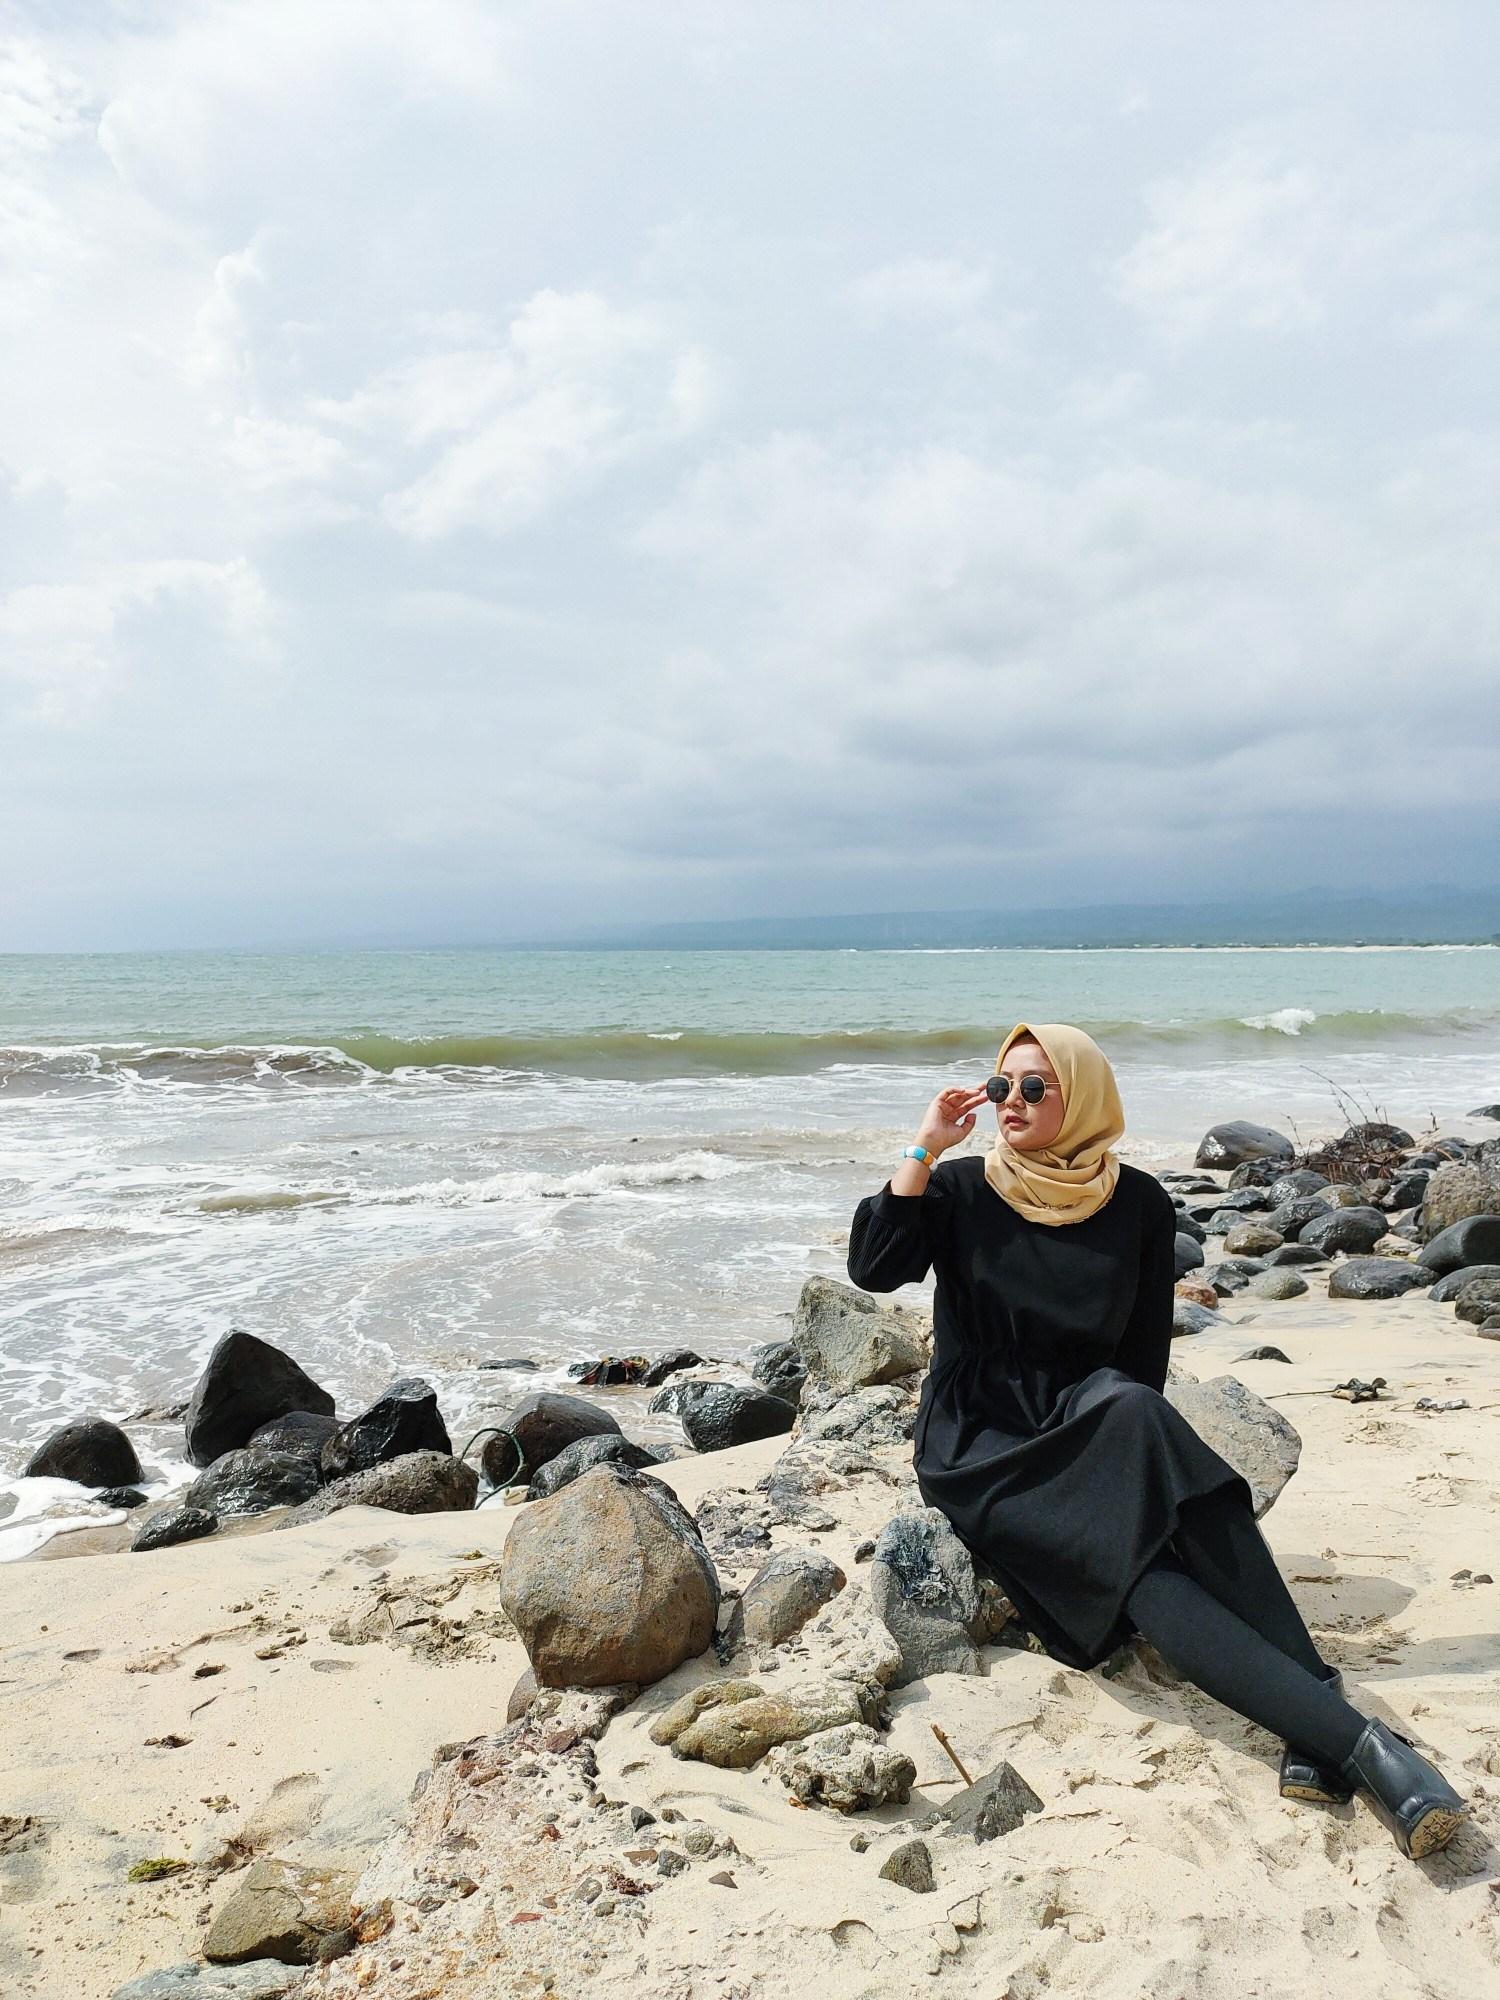 Ririnaprilian's Cover Photo